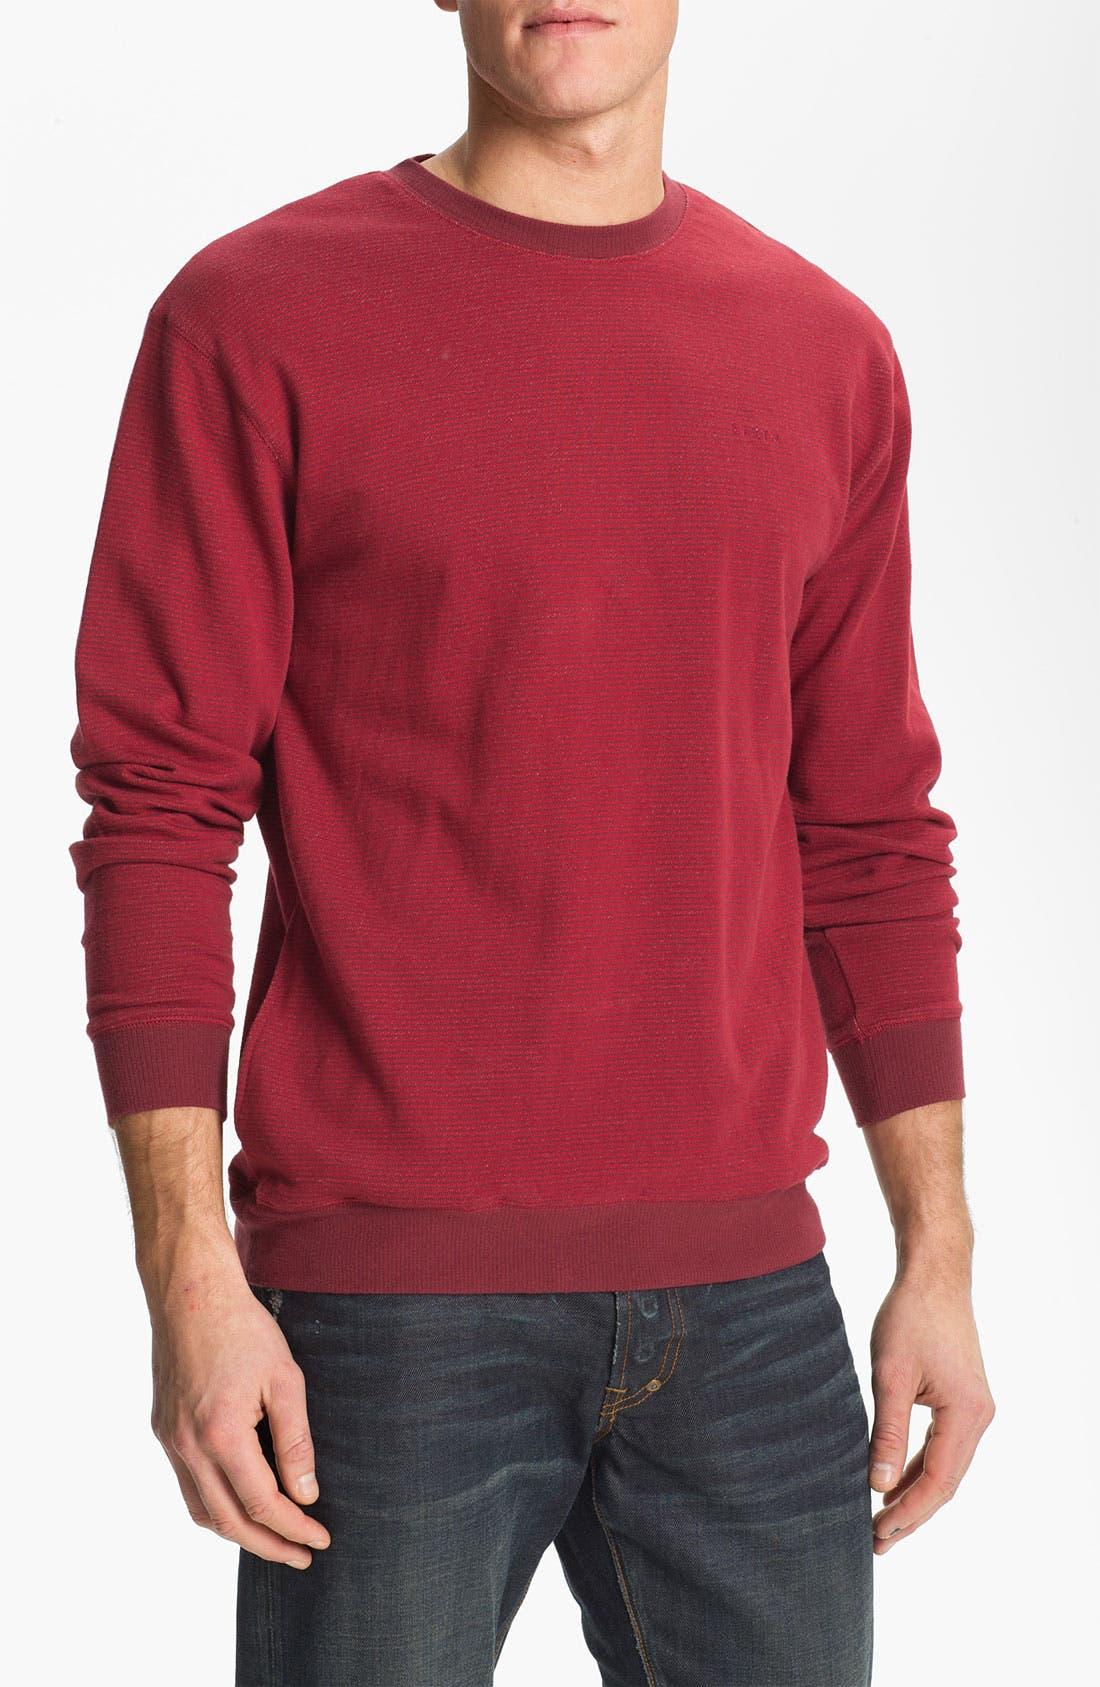 Alternate Image 1 Selected - Brixton 'Partisan' Stripe French Terry Crewneck Sweatshirt